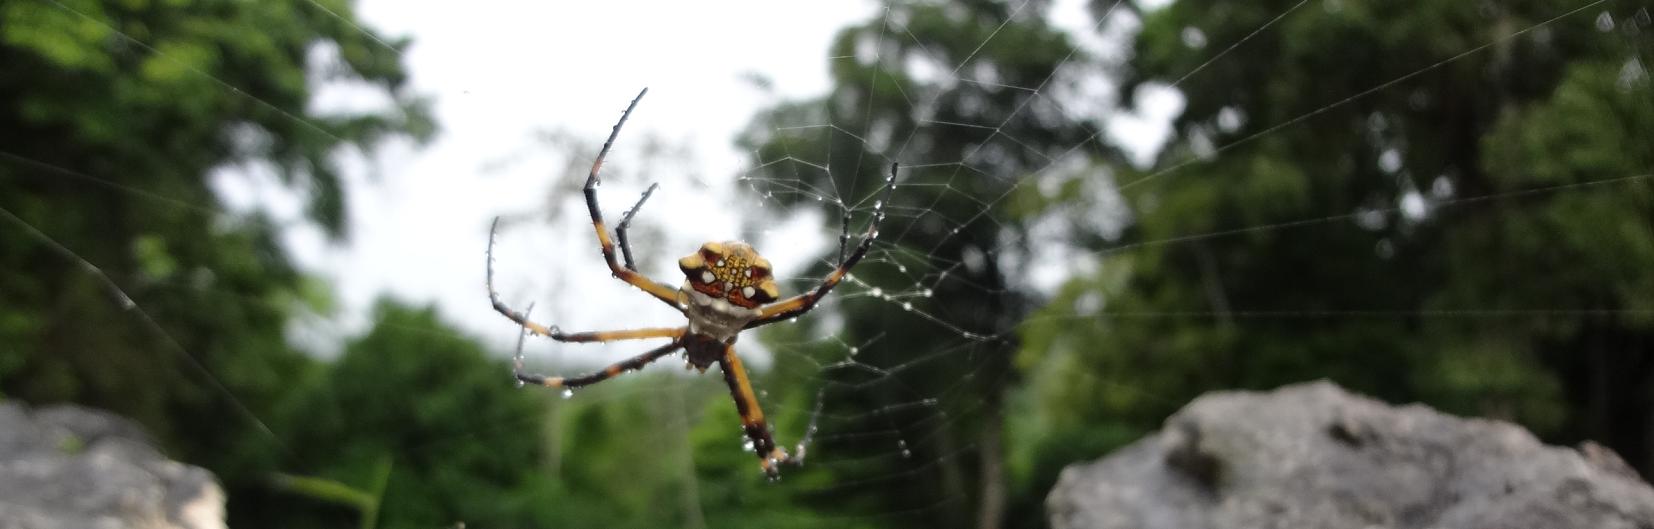 spinnenwering